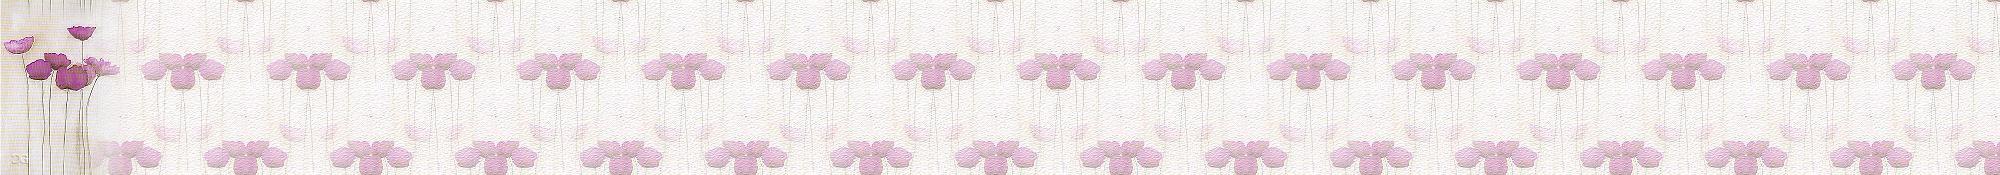 Fondo IM flores_014.imf